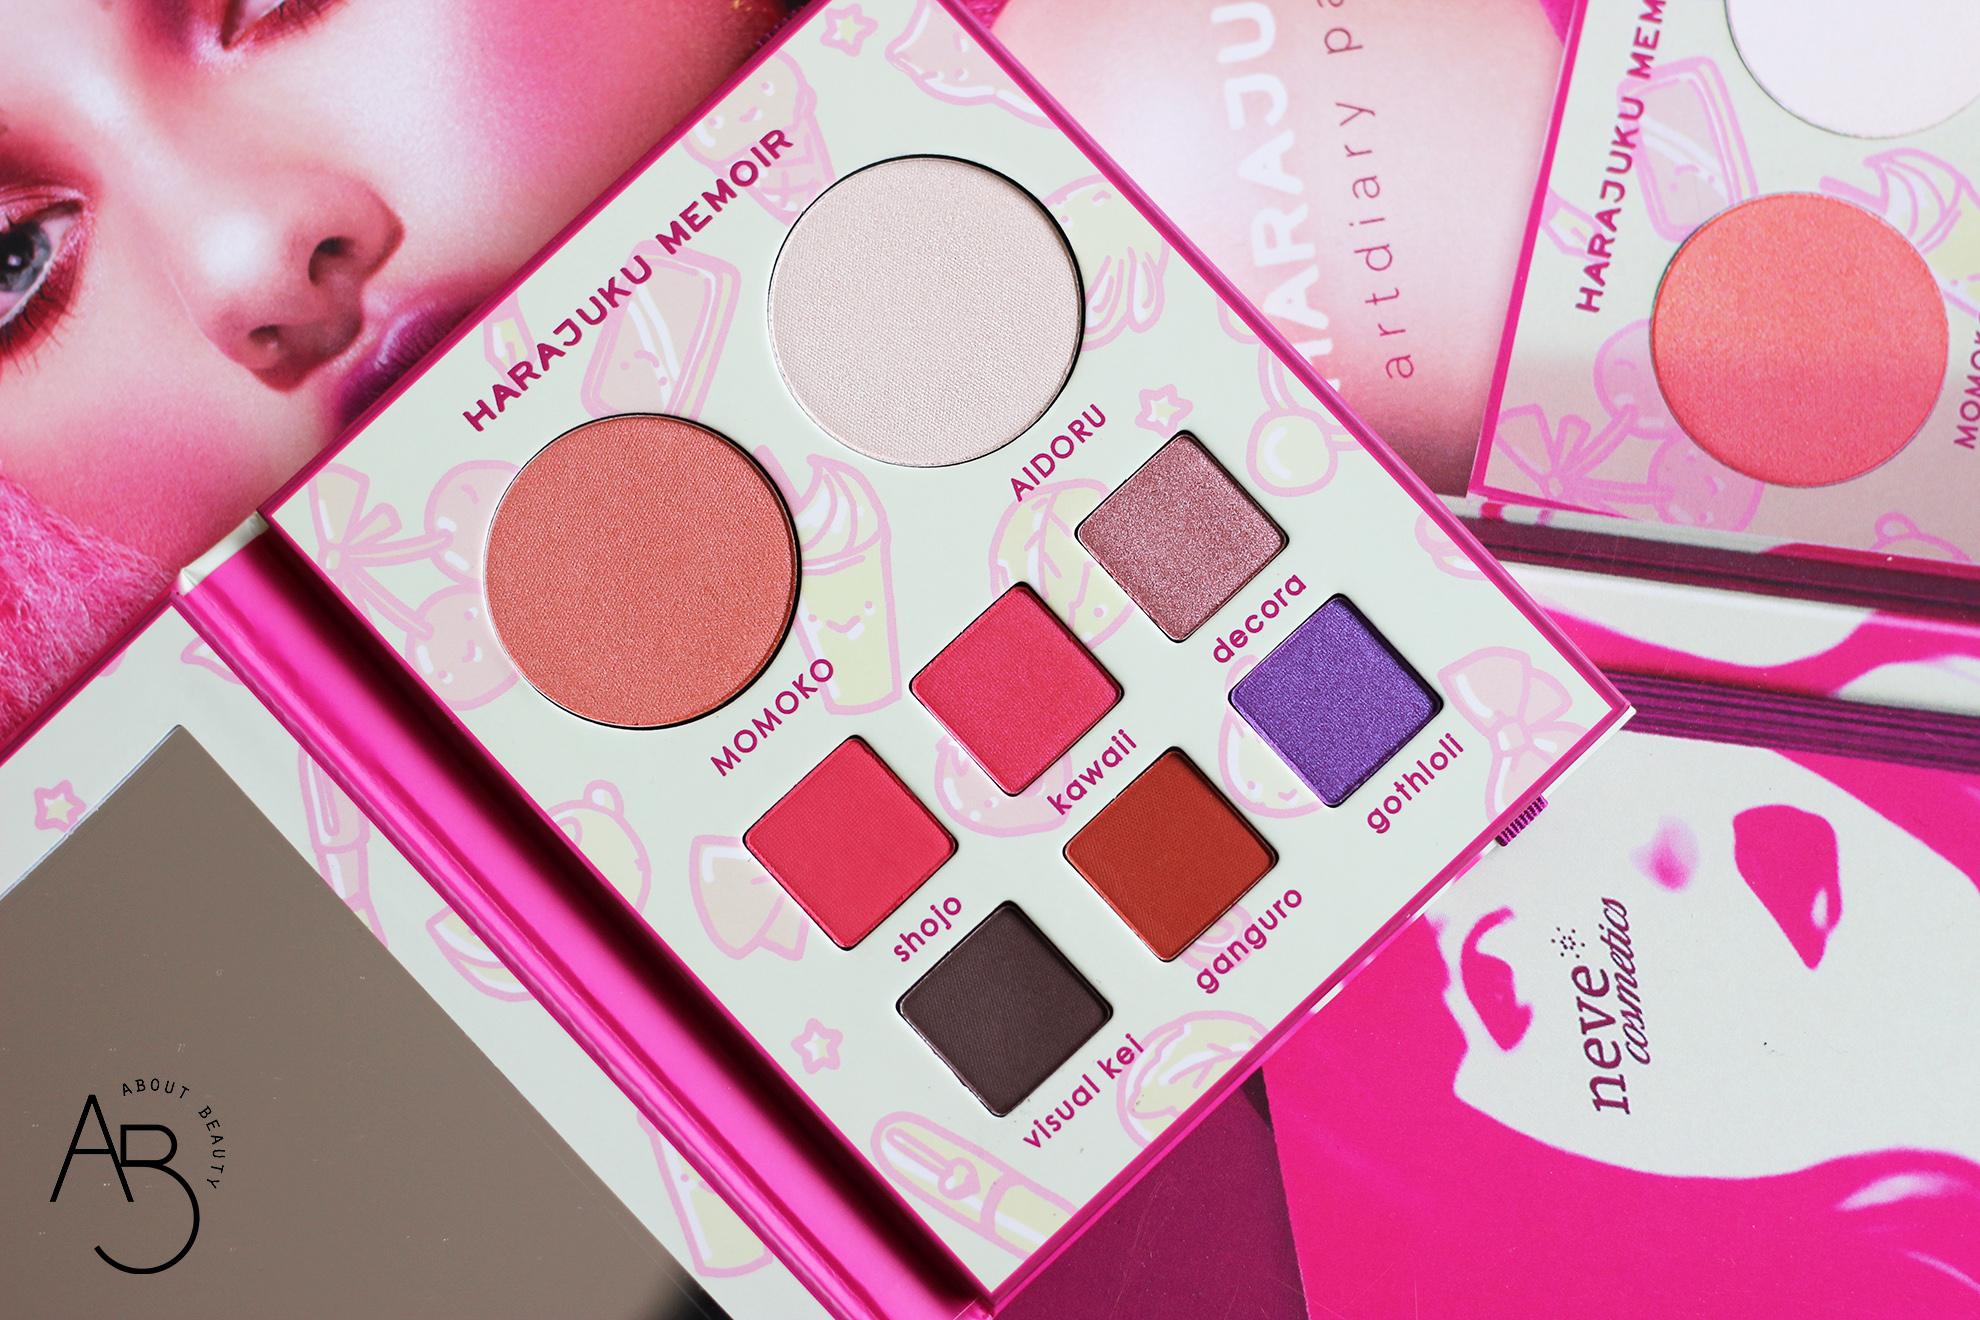 neve cosmetics harajuku memoir palette ombretti eyeshadow - info recensione swatch inci opinioni review tutorial codice sconto